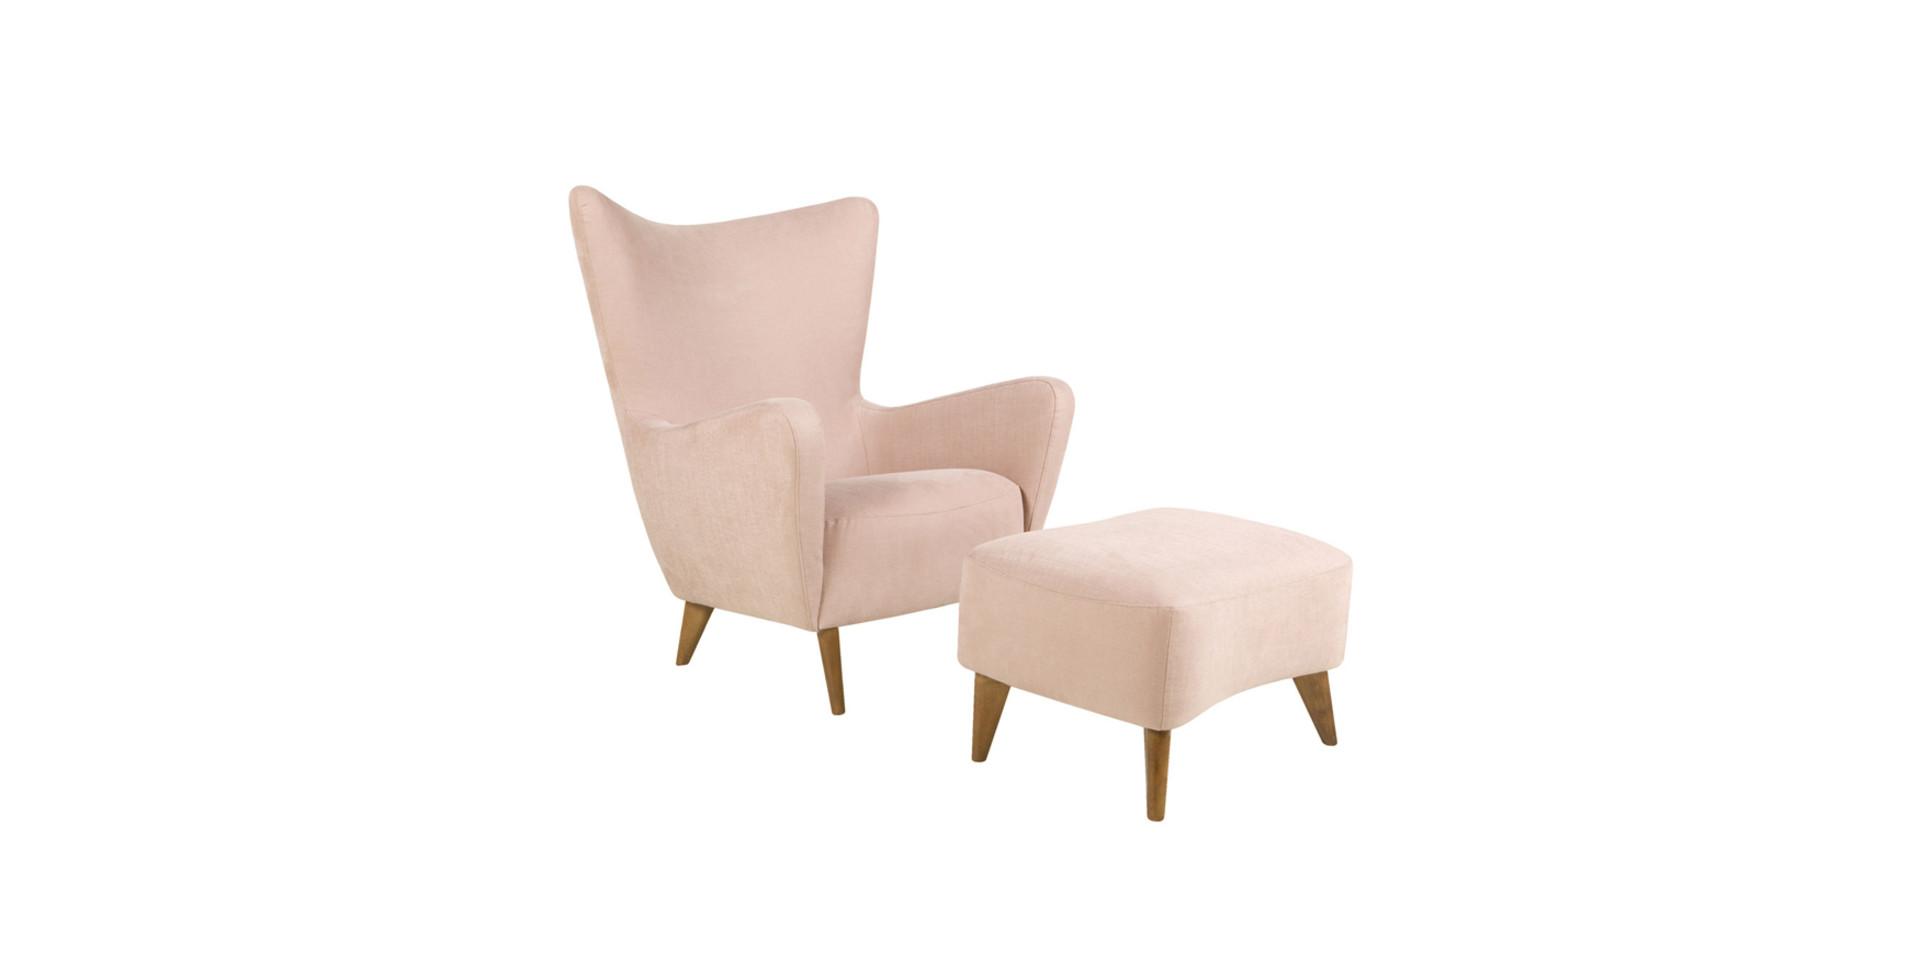 ELSA_armchair_footstool_caleido2994_light_brown_3